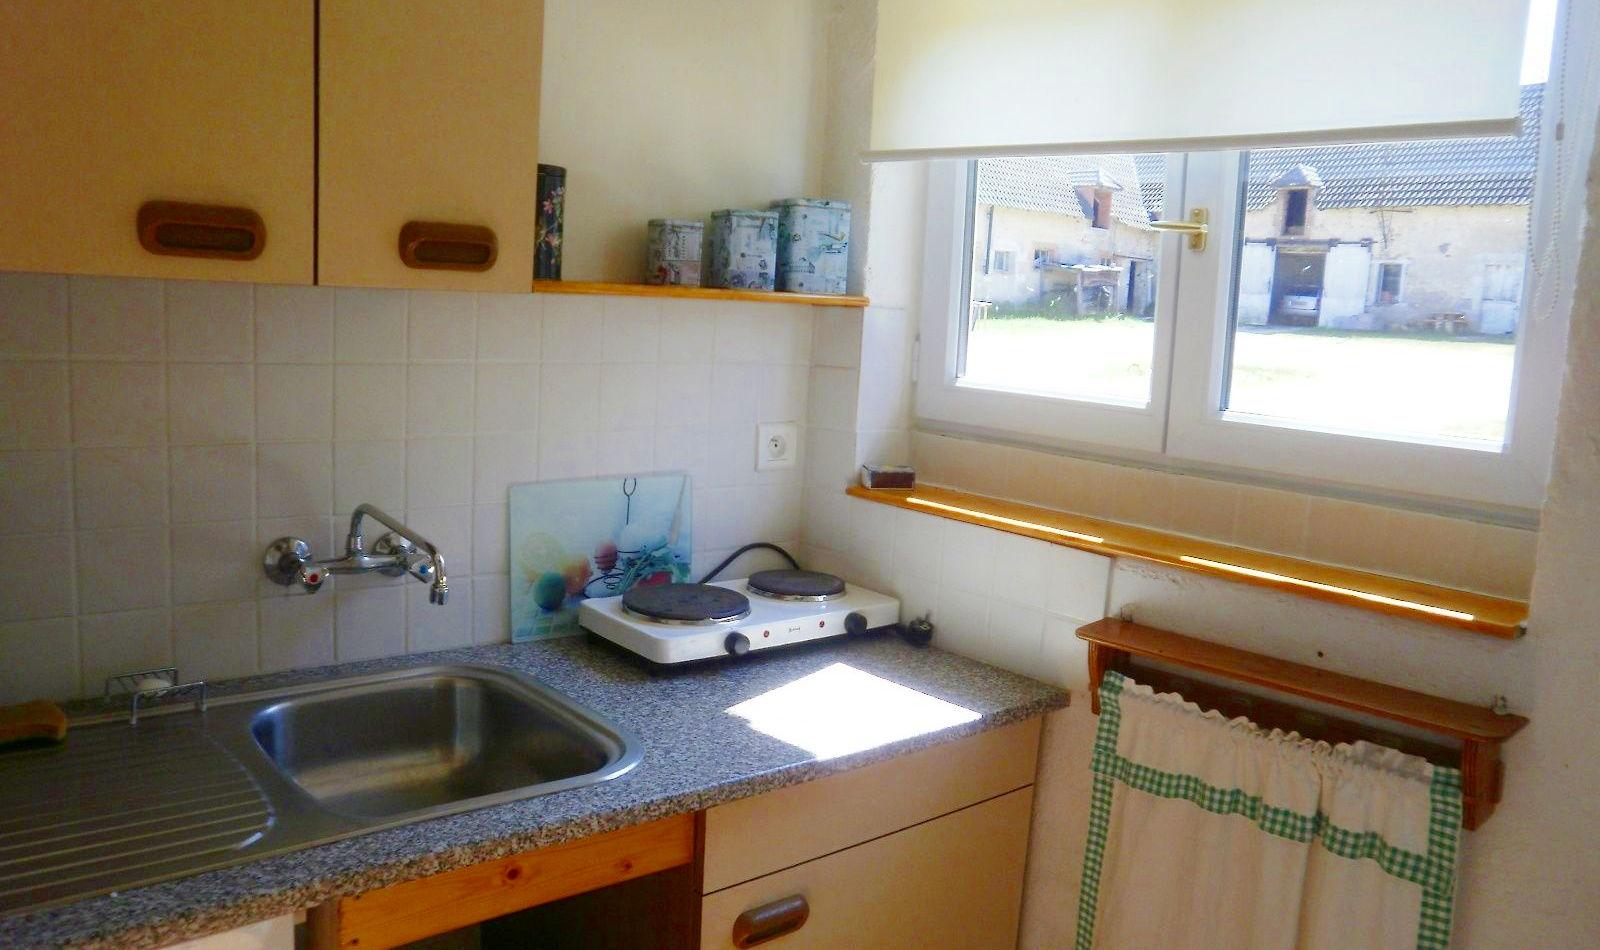 045-huisje-frankrijk-vallon-keuken